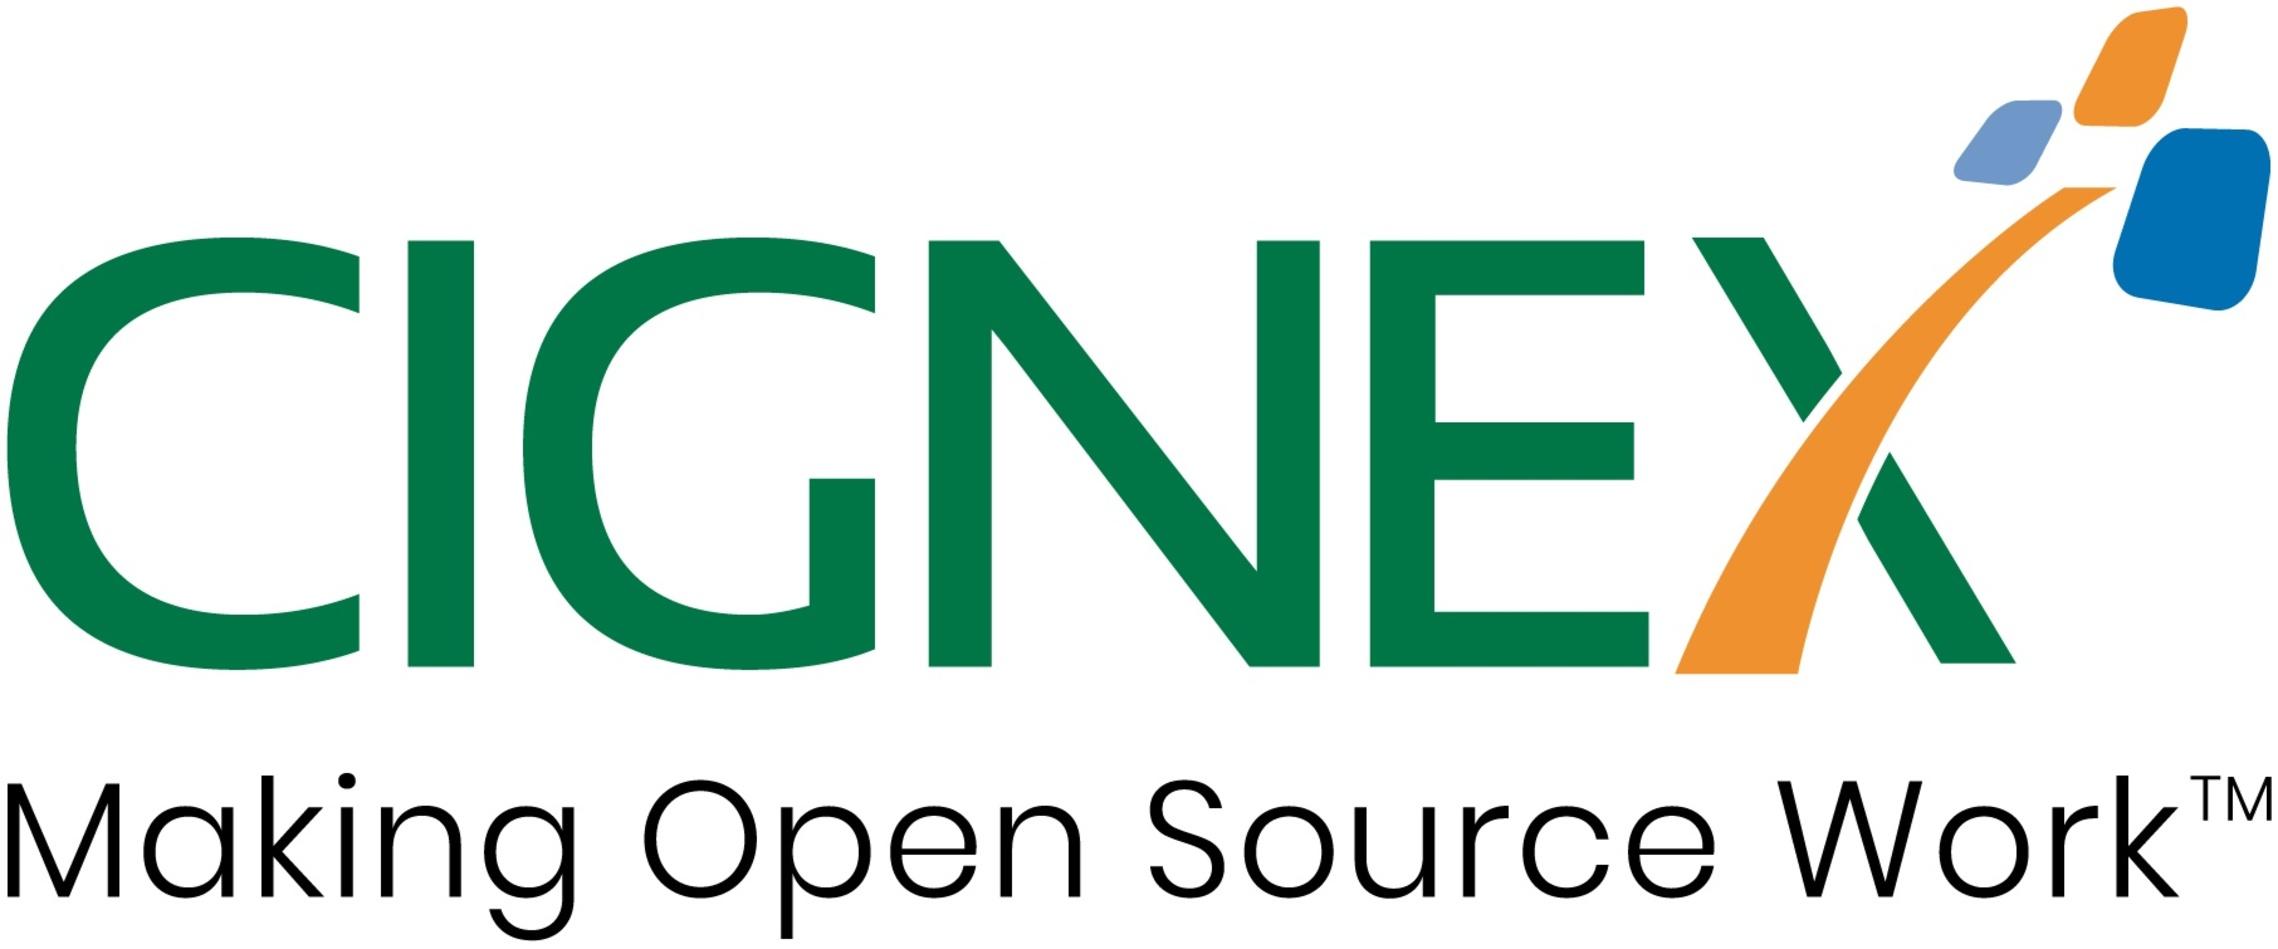 CIGNEX Datamatics Contributes to the Robotic Process Automation